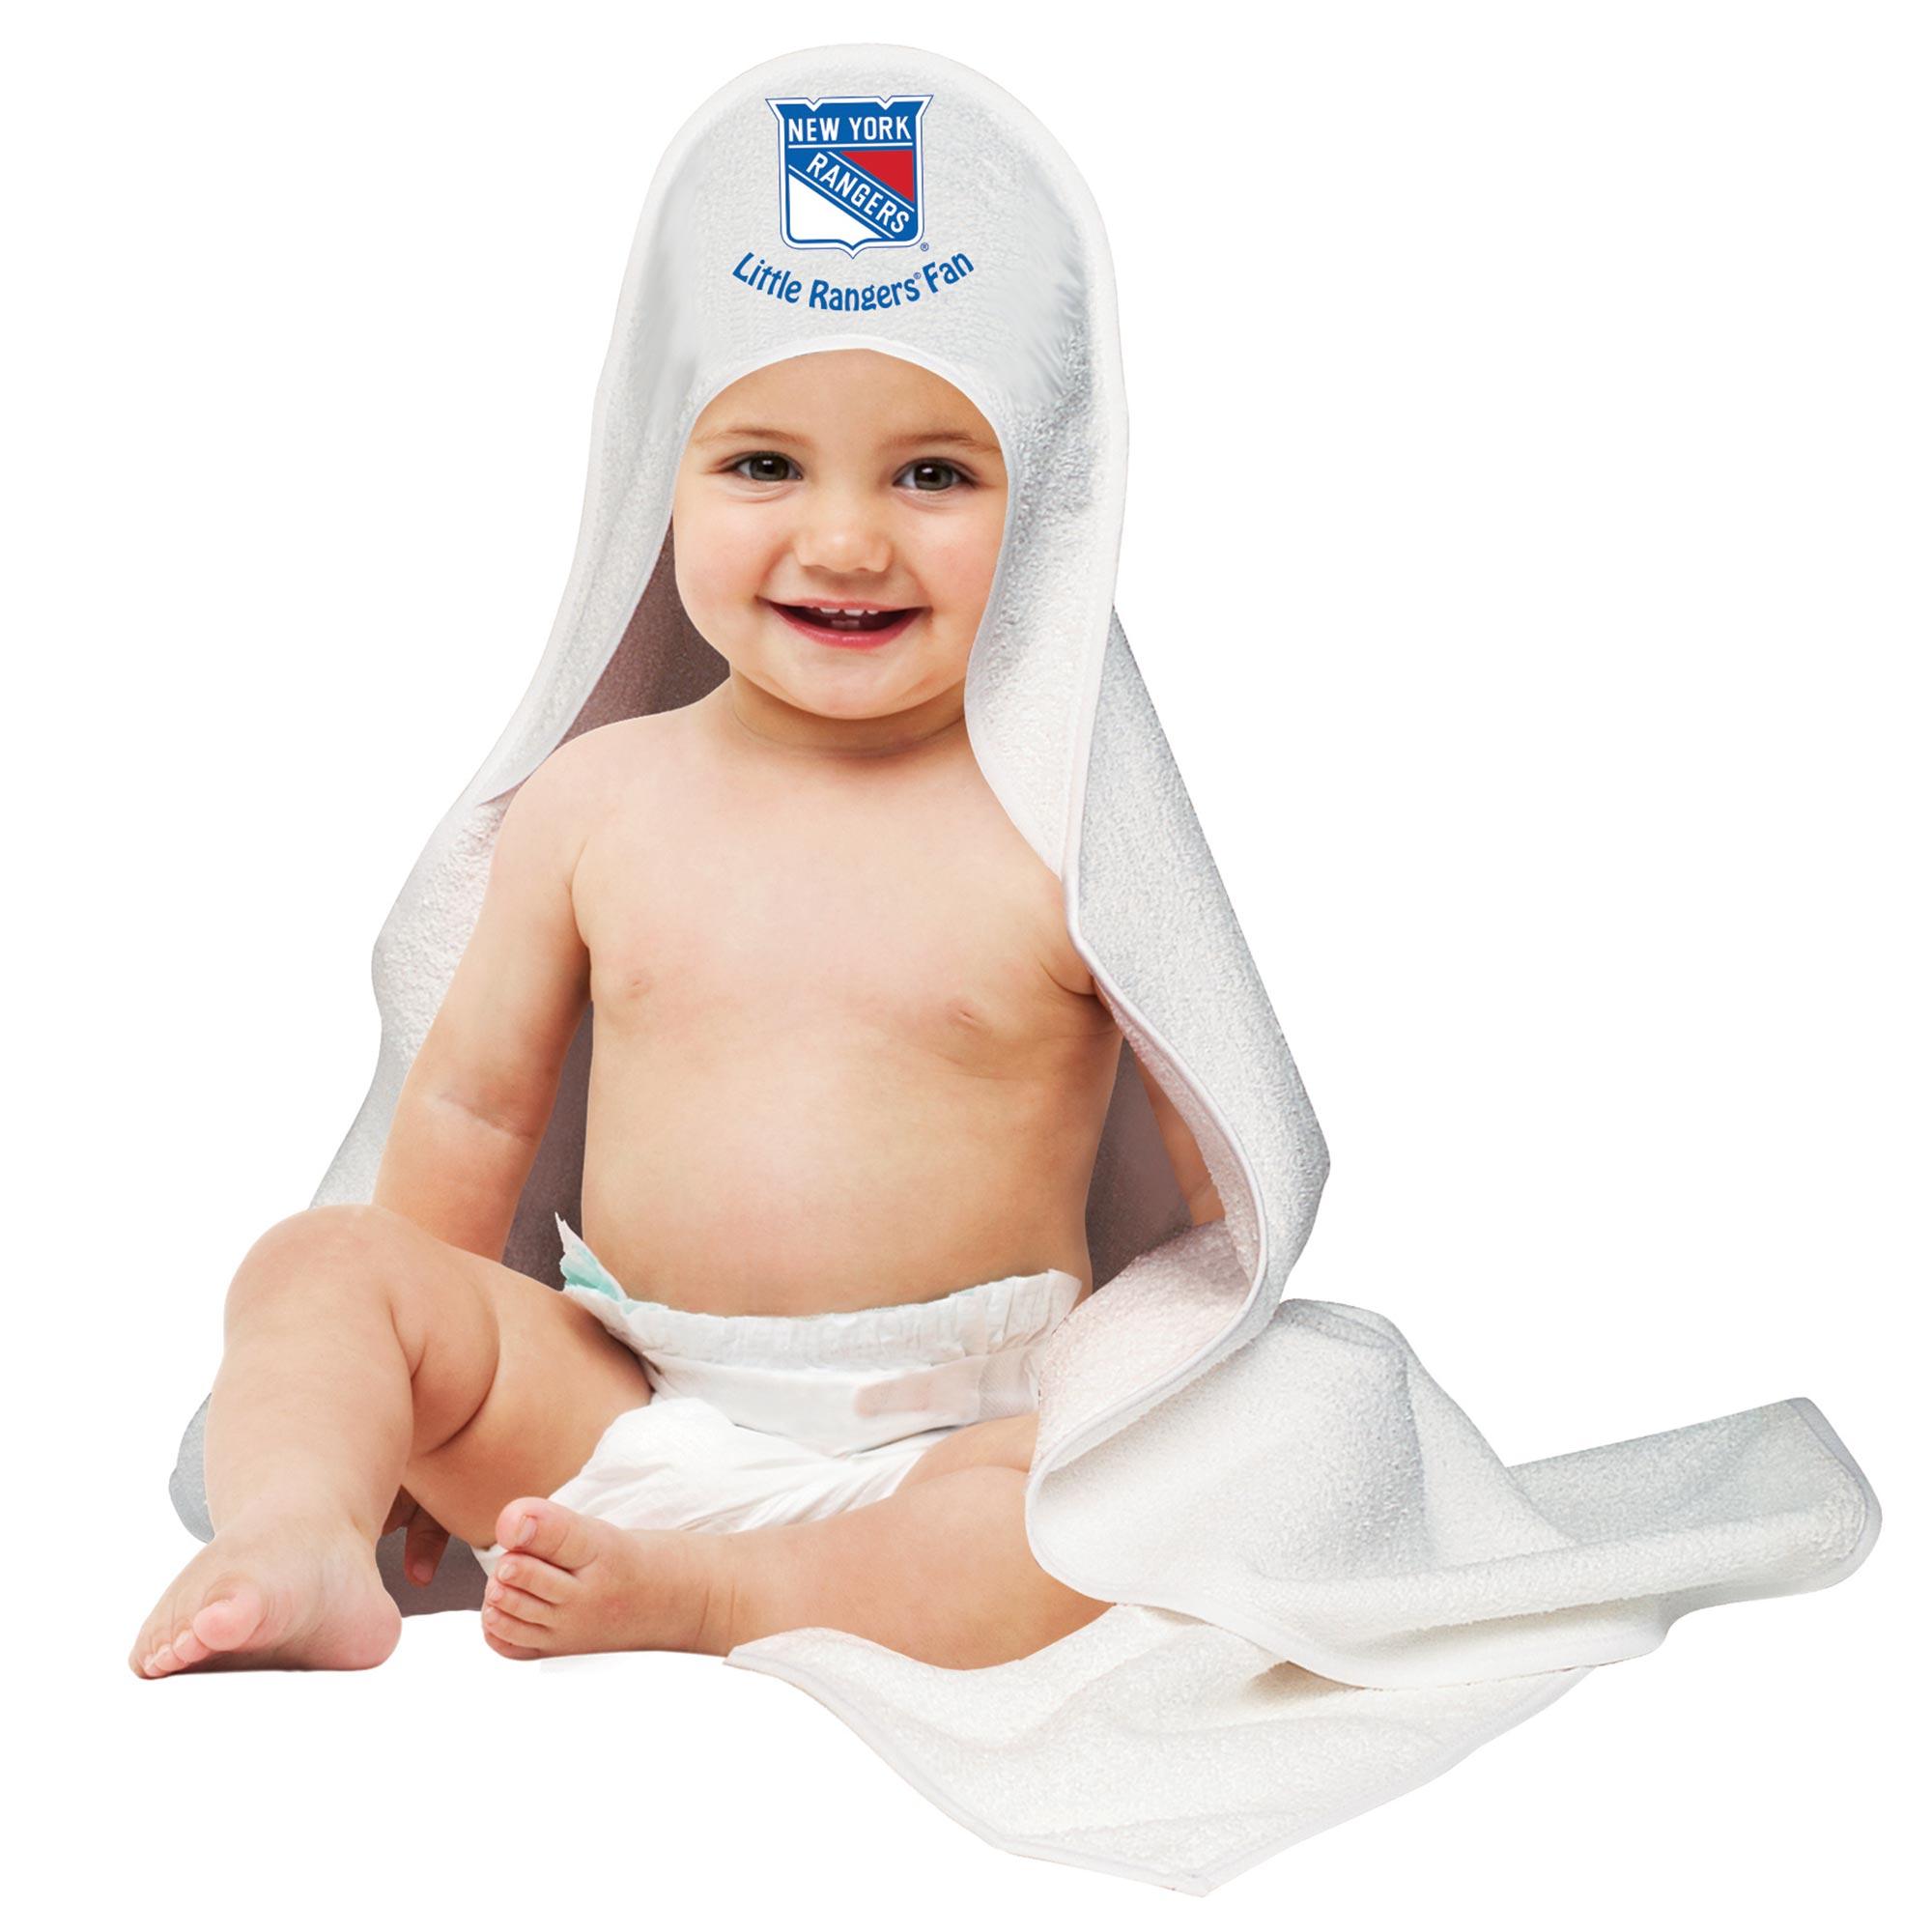 New York Rangers Hooded Baby Towel